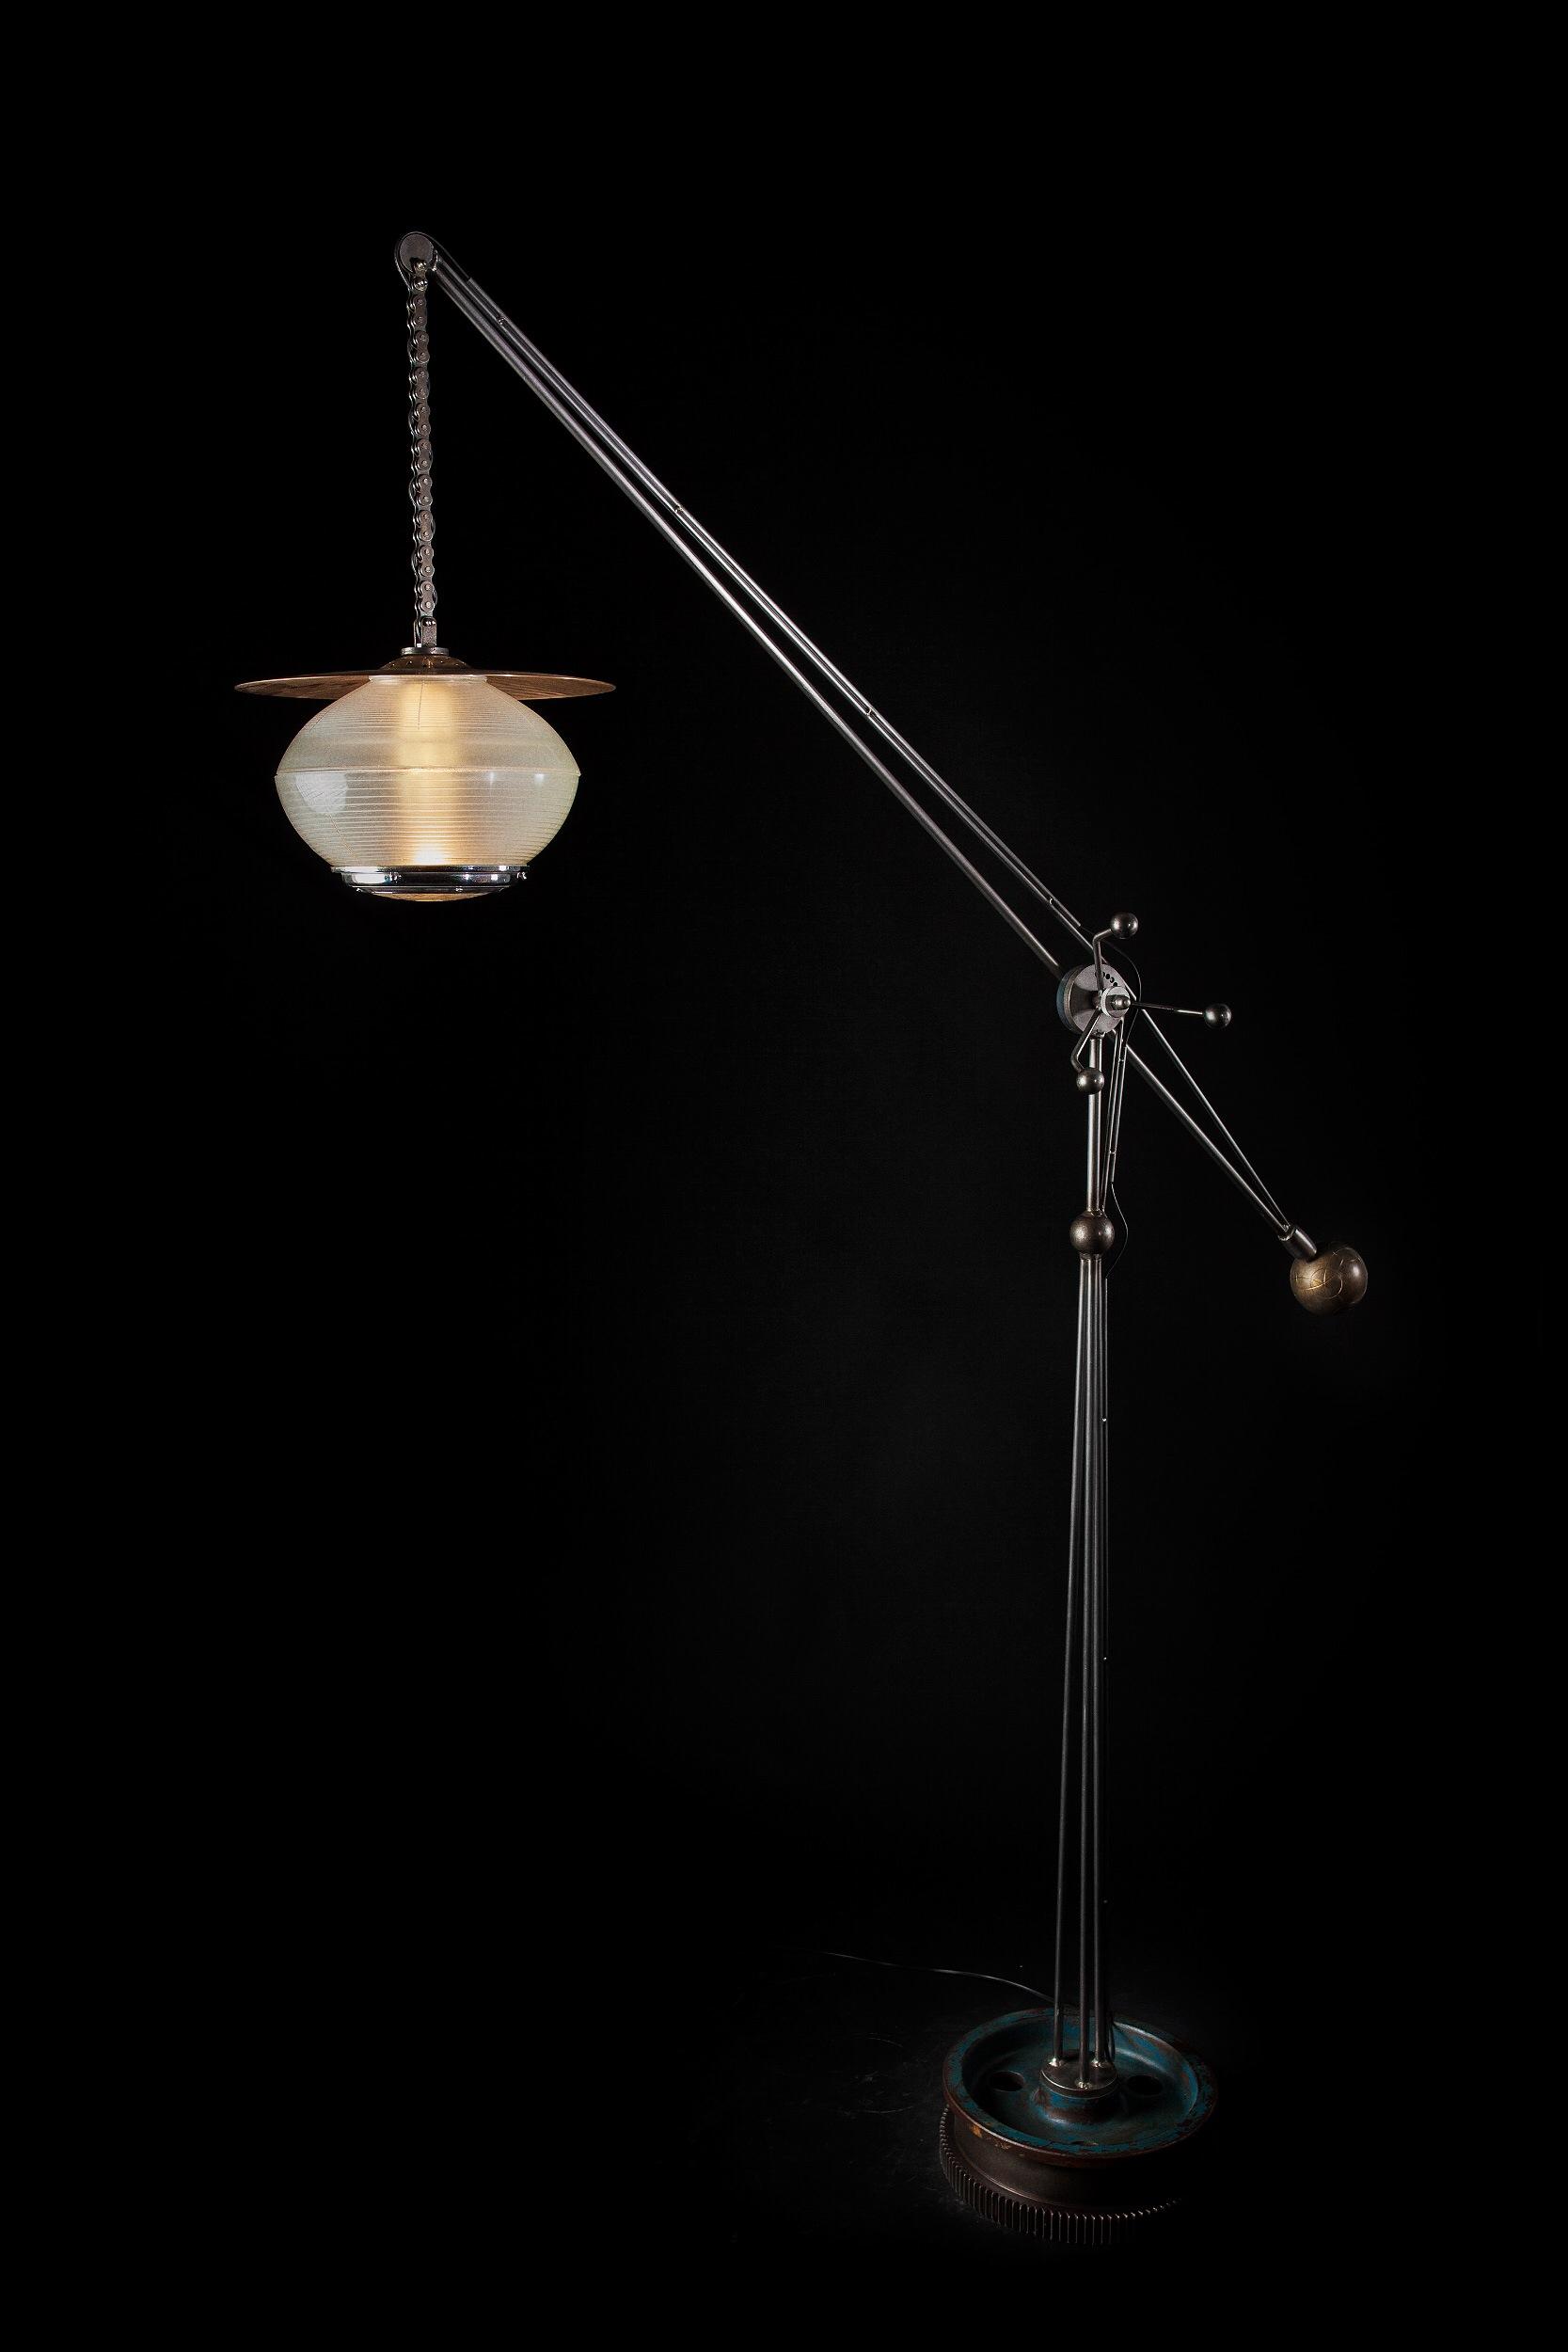 Paris NewYorker - Glass on air